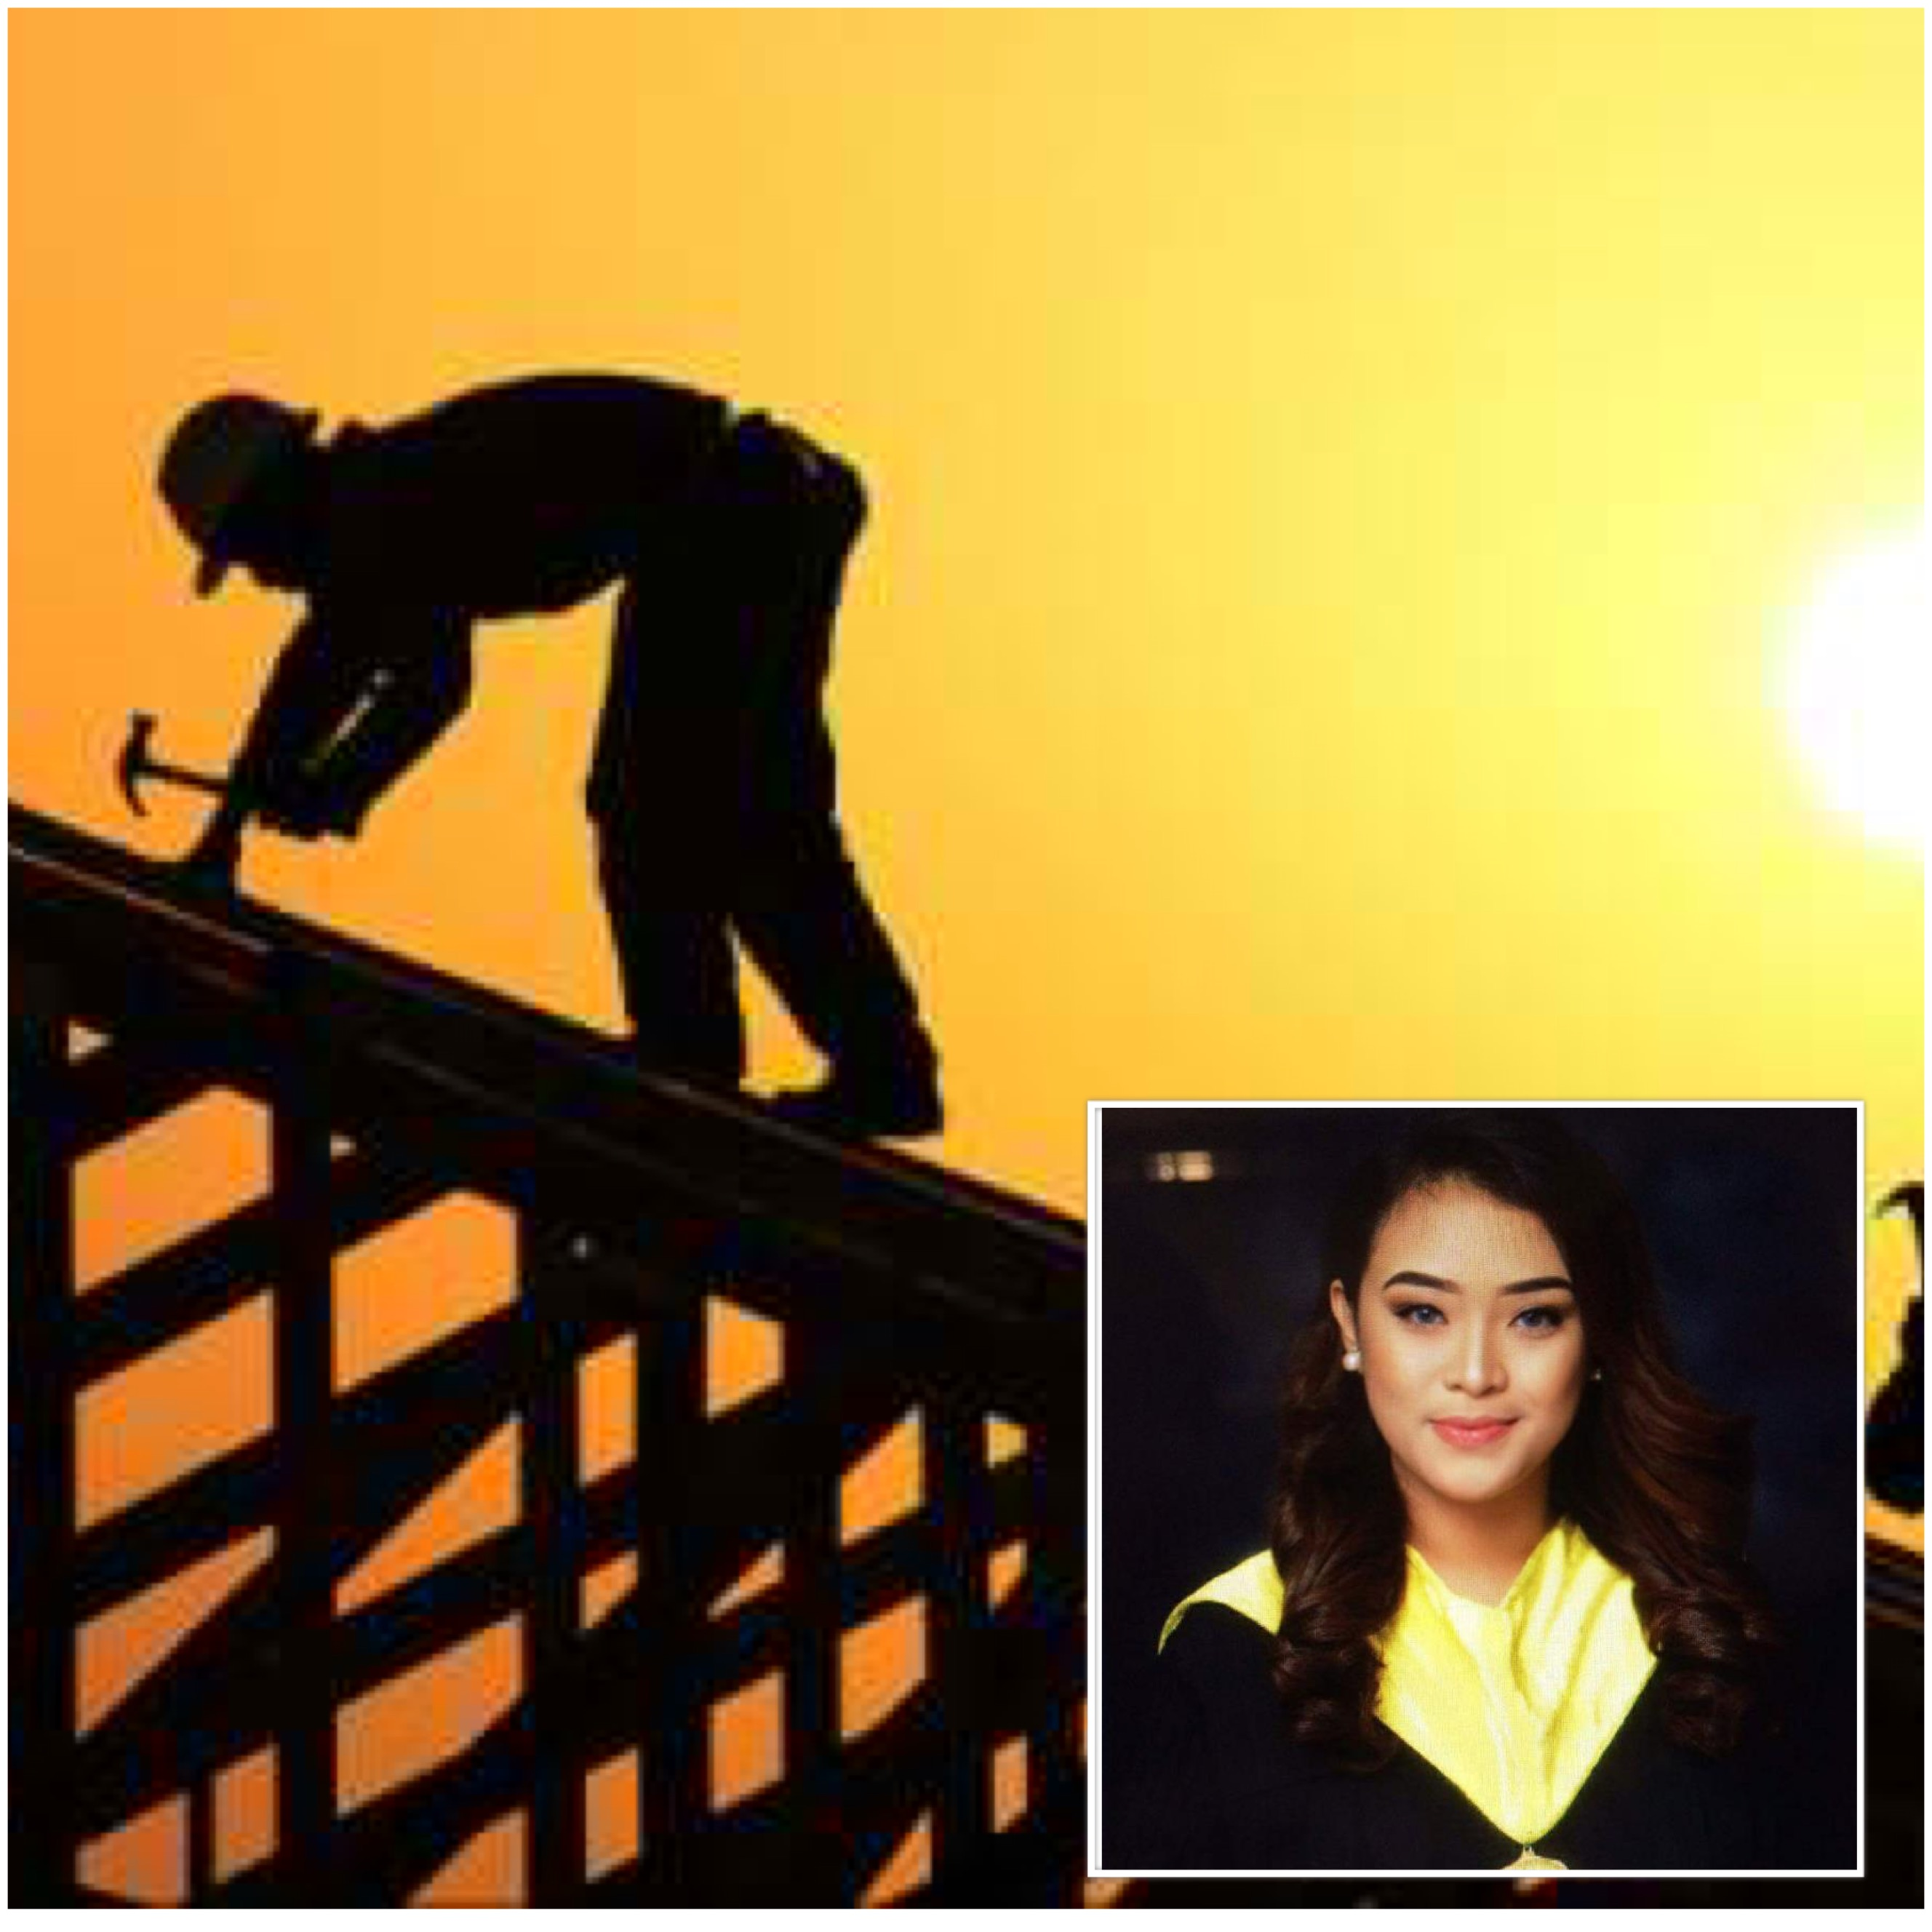 Daughter of construction worker graduates as full scholar, inspires netizens